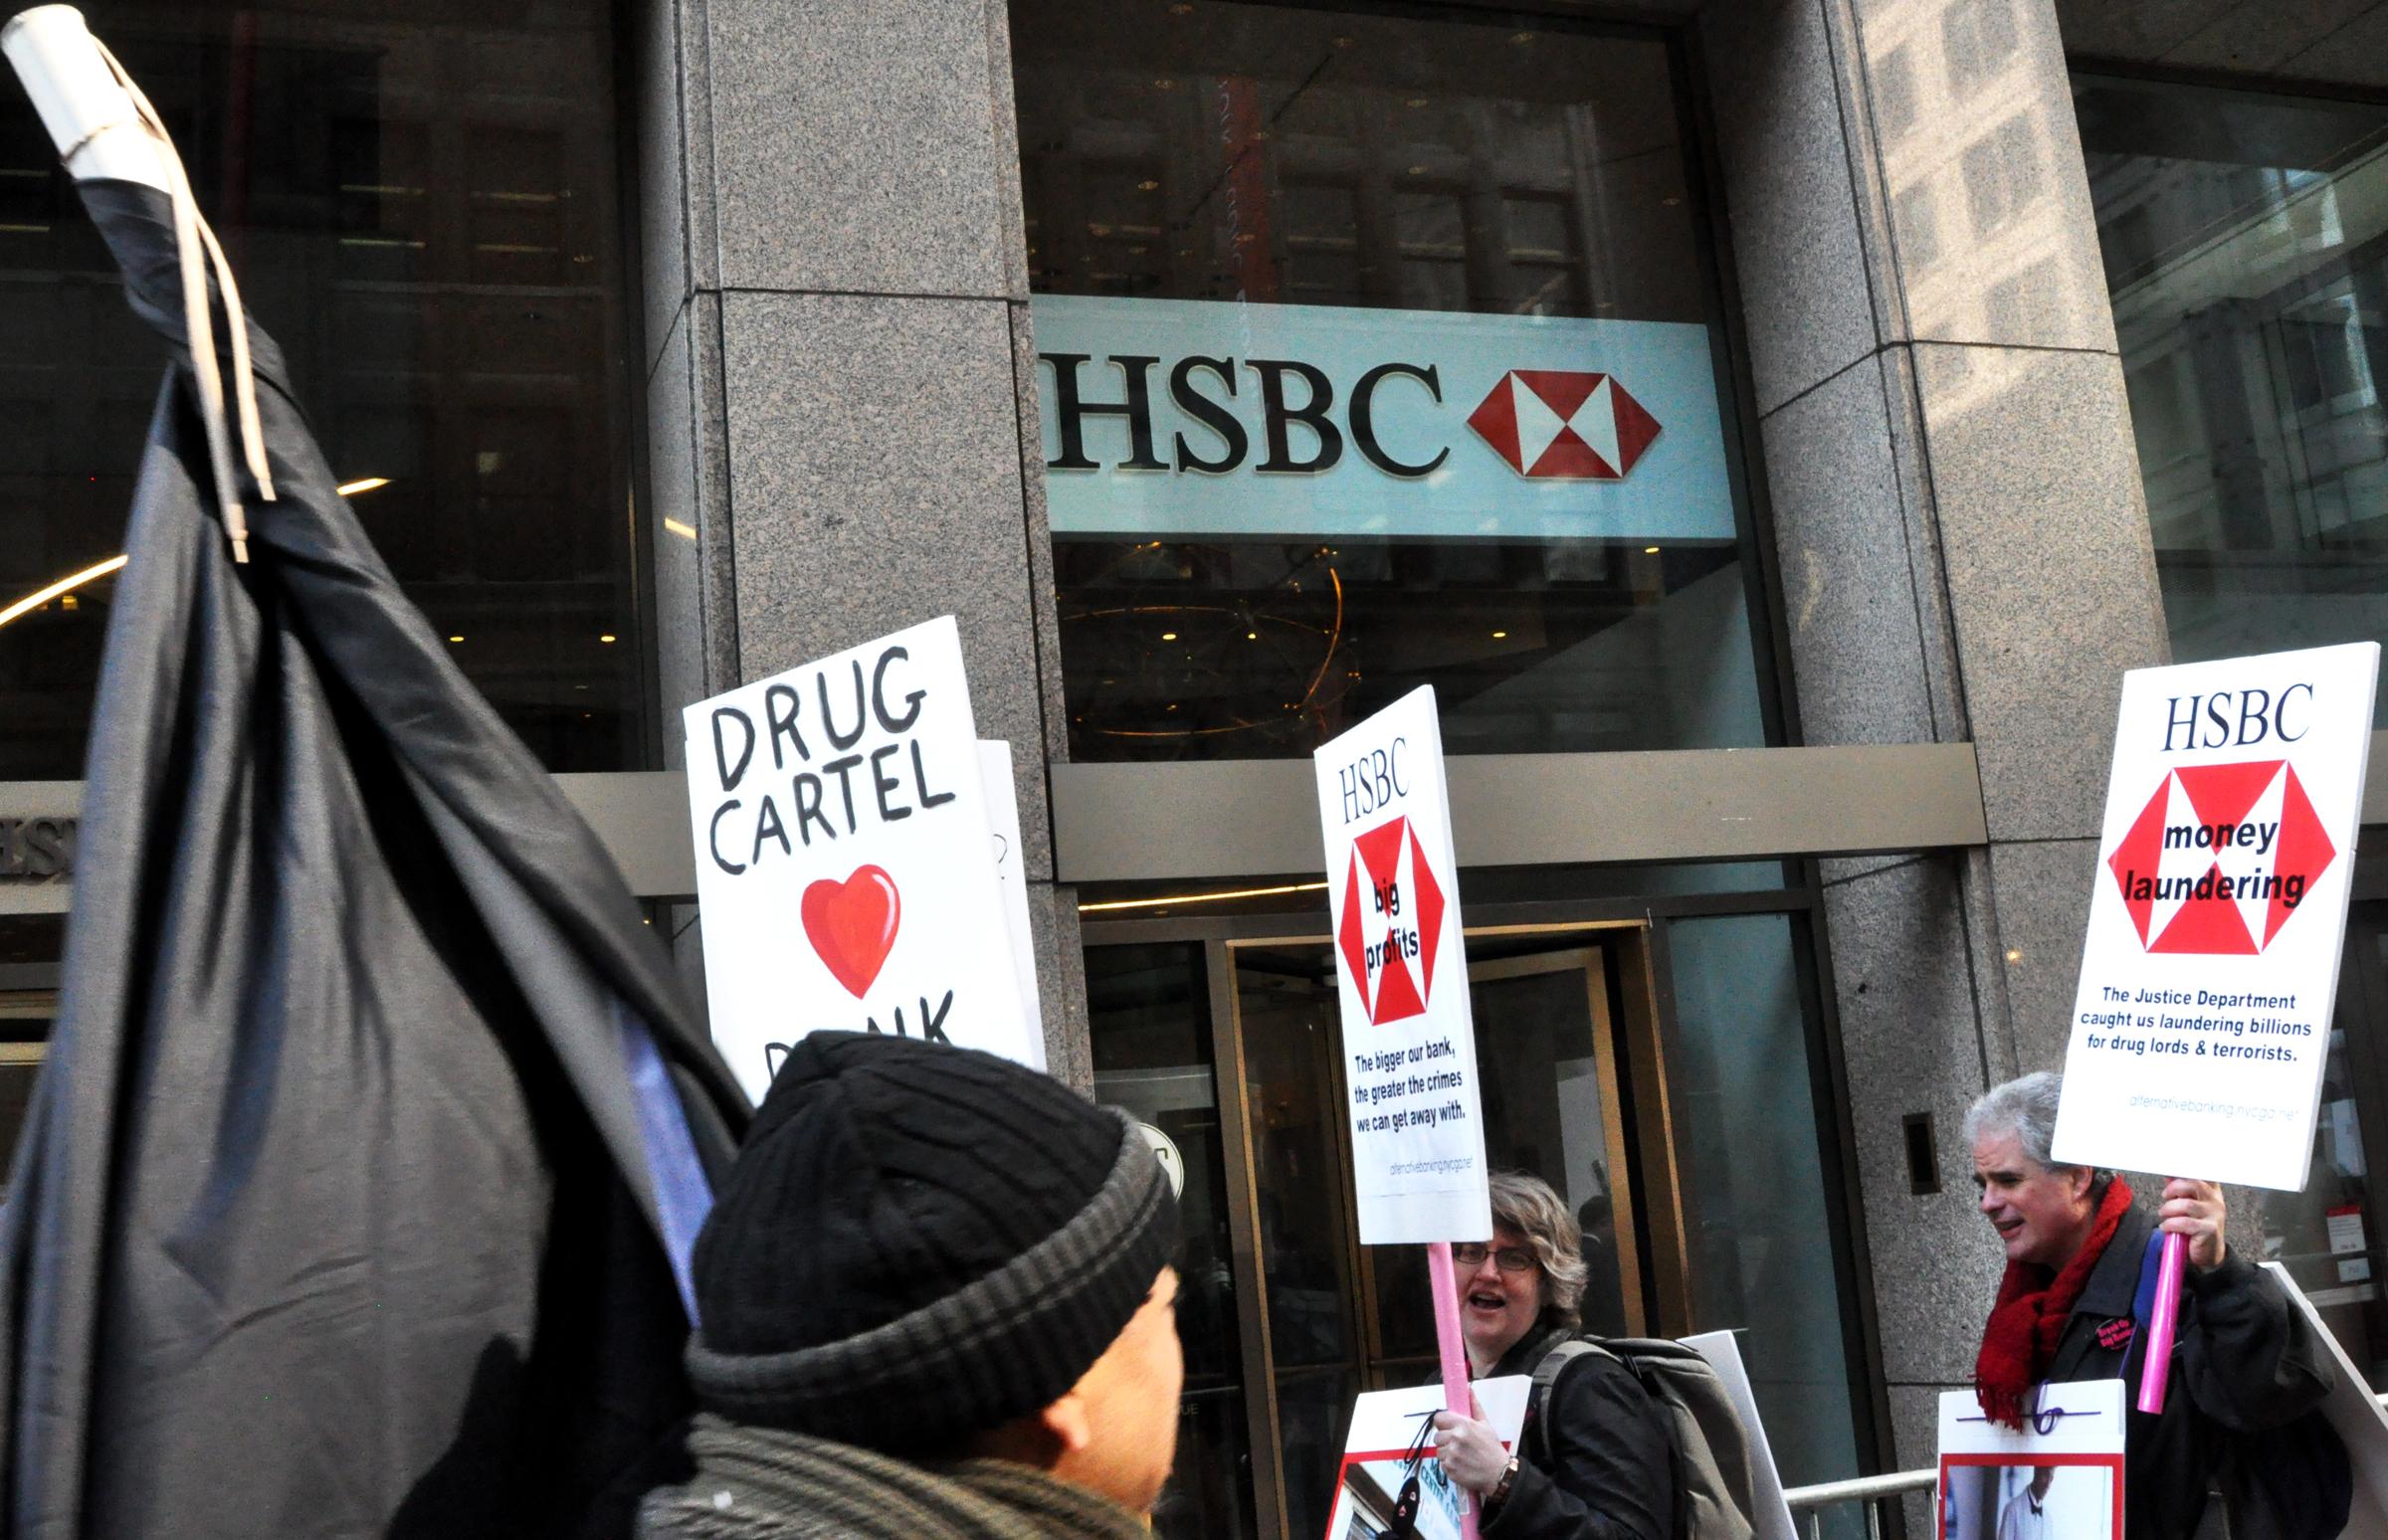 Occupy Wall Street picket of HSBC, midtown Manhattan; Feb. 14, 2013. (Michael Fleshman Via Flickr)